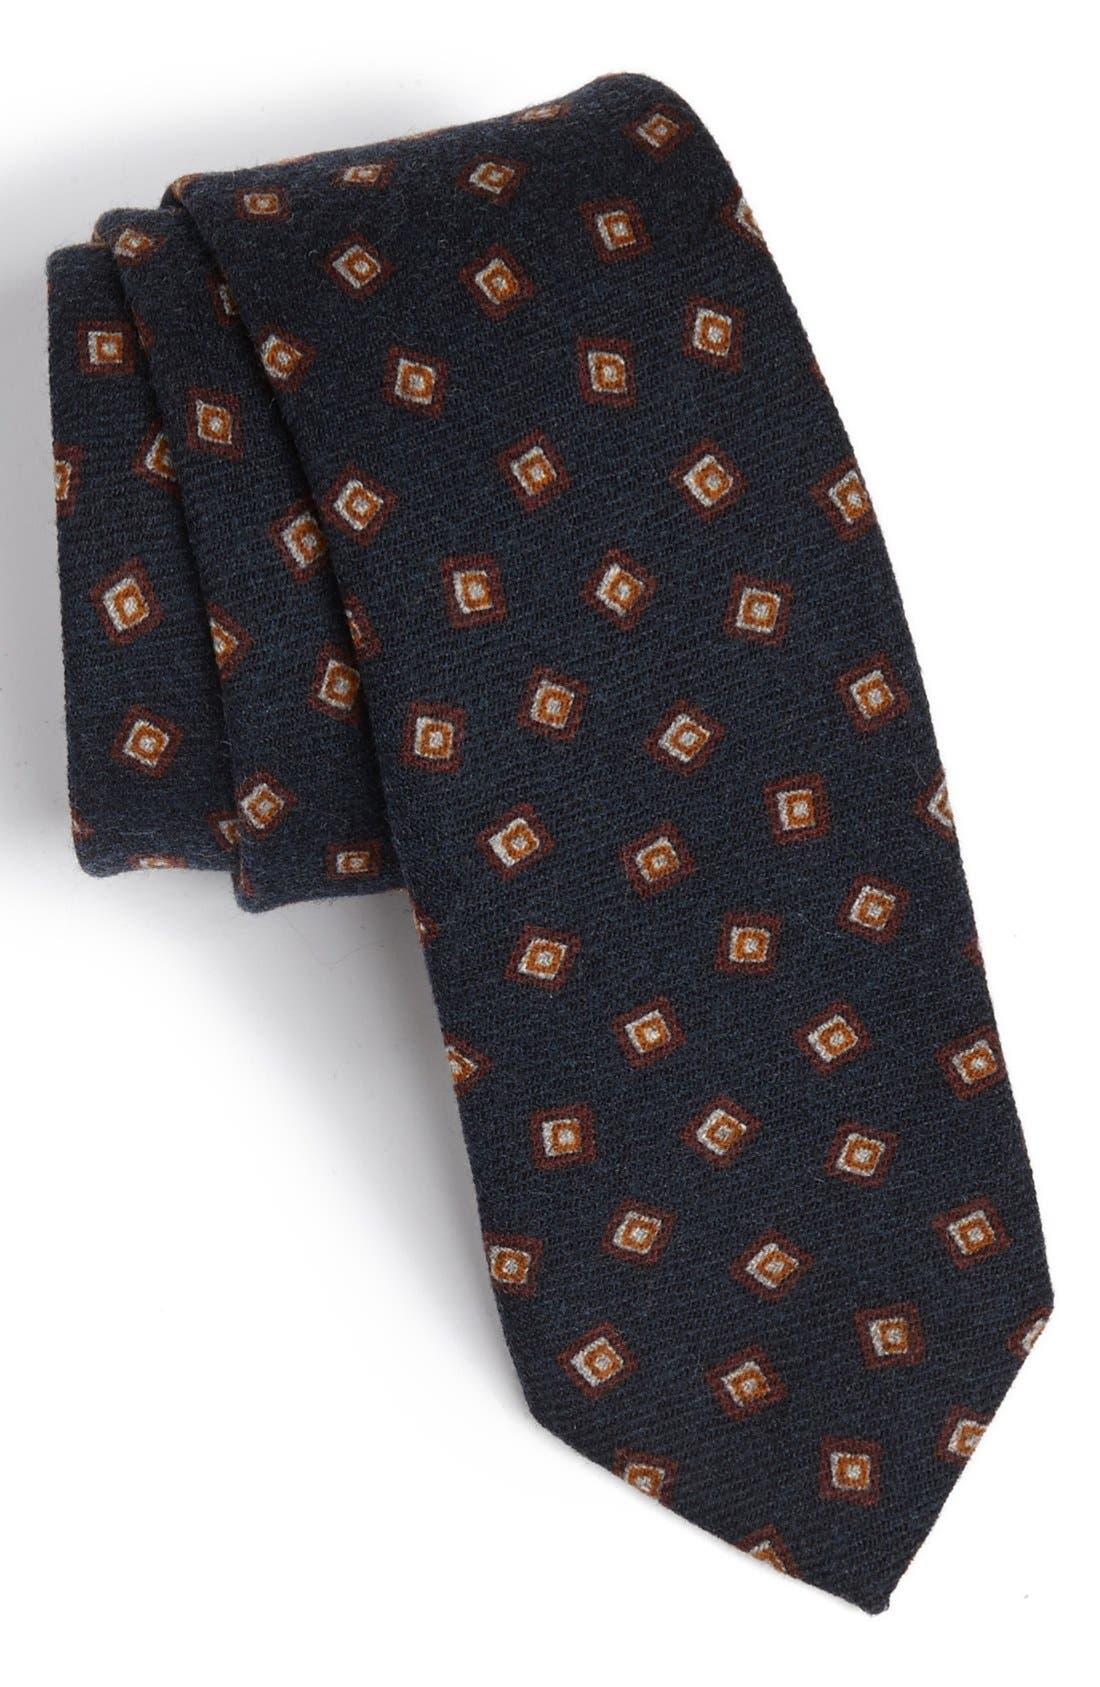 Alternate Image 1 Selected - BOSS HUGO BOSS Woven Wool Tie